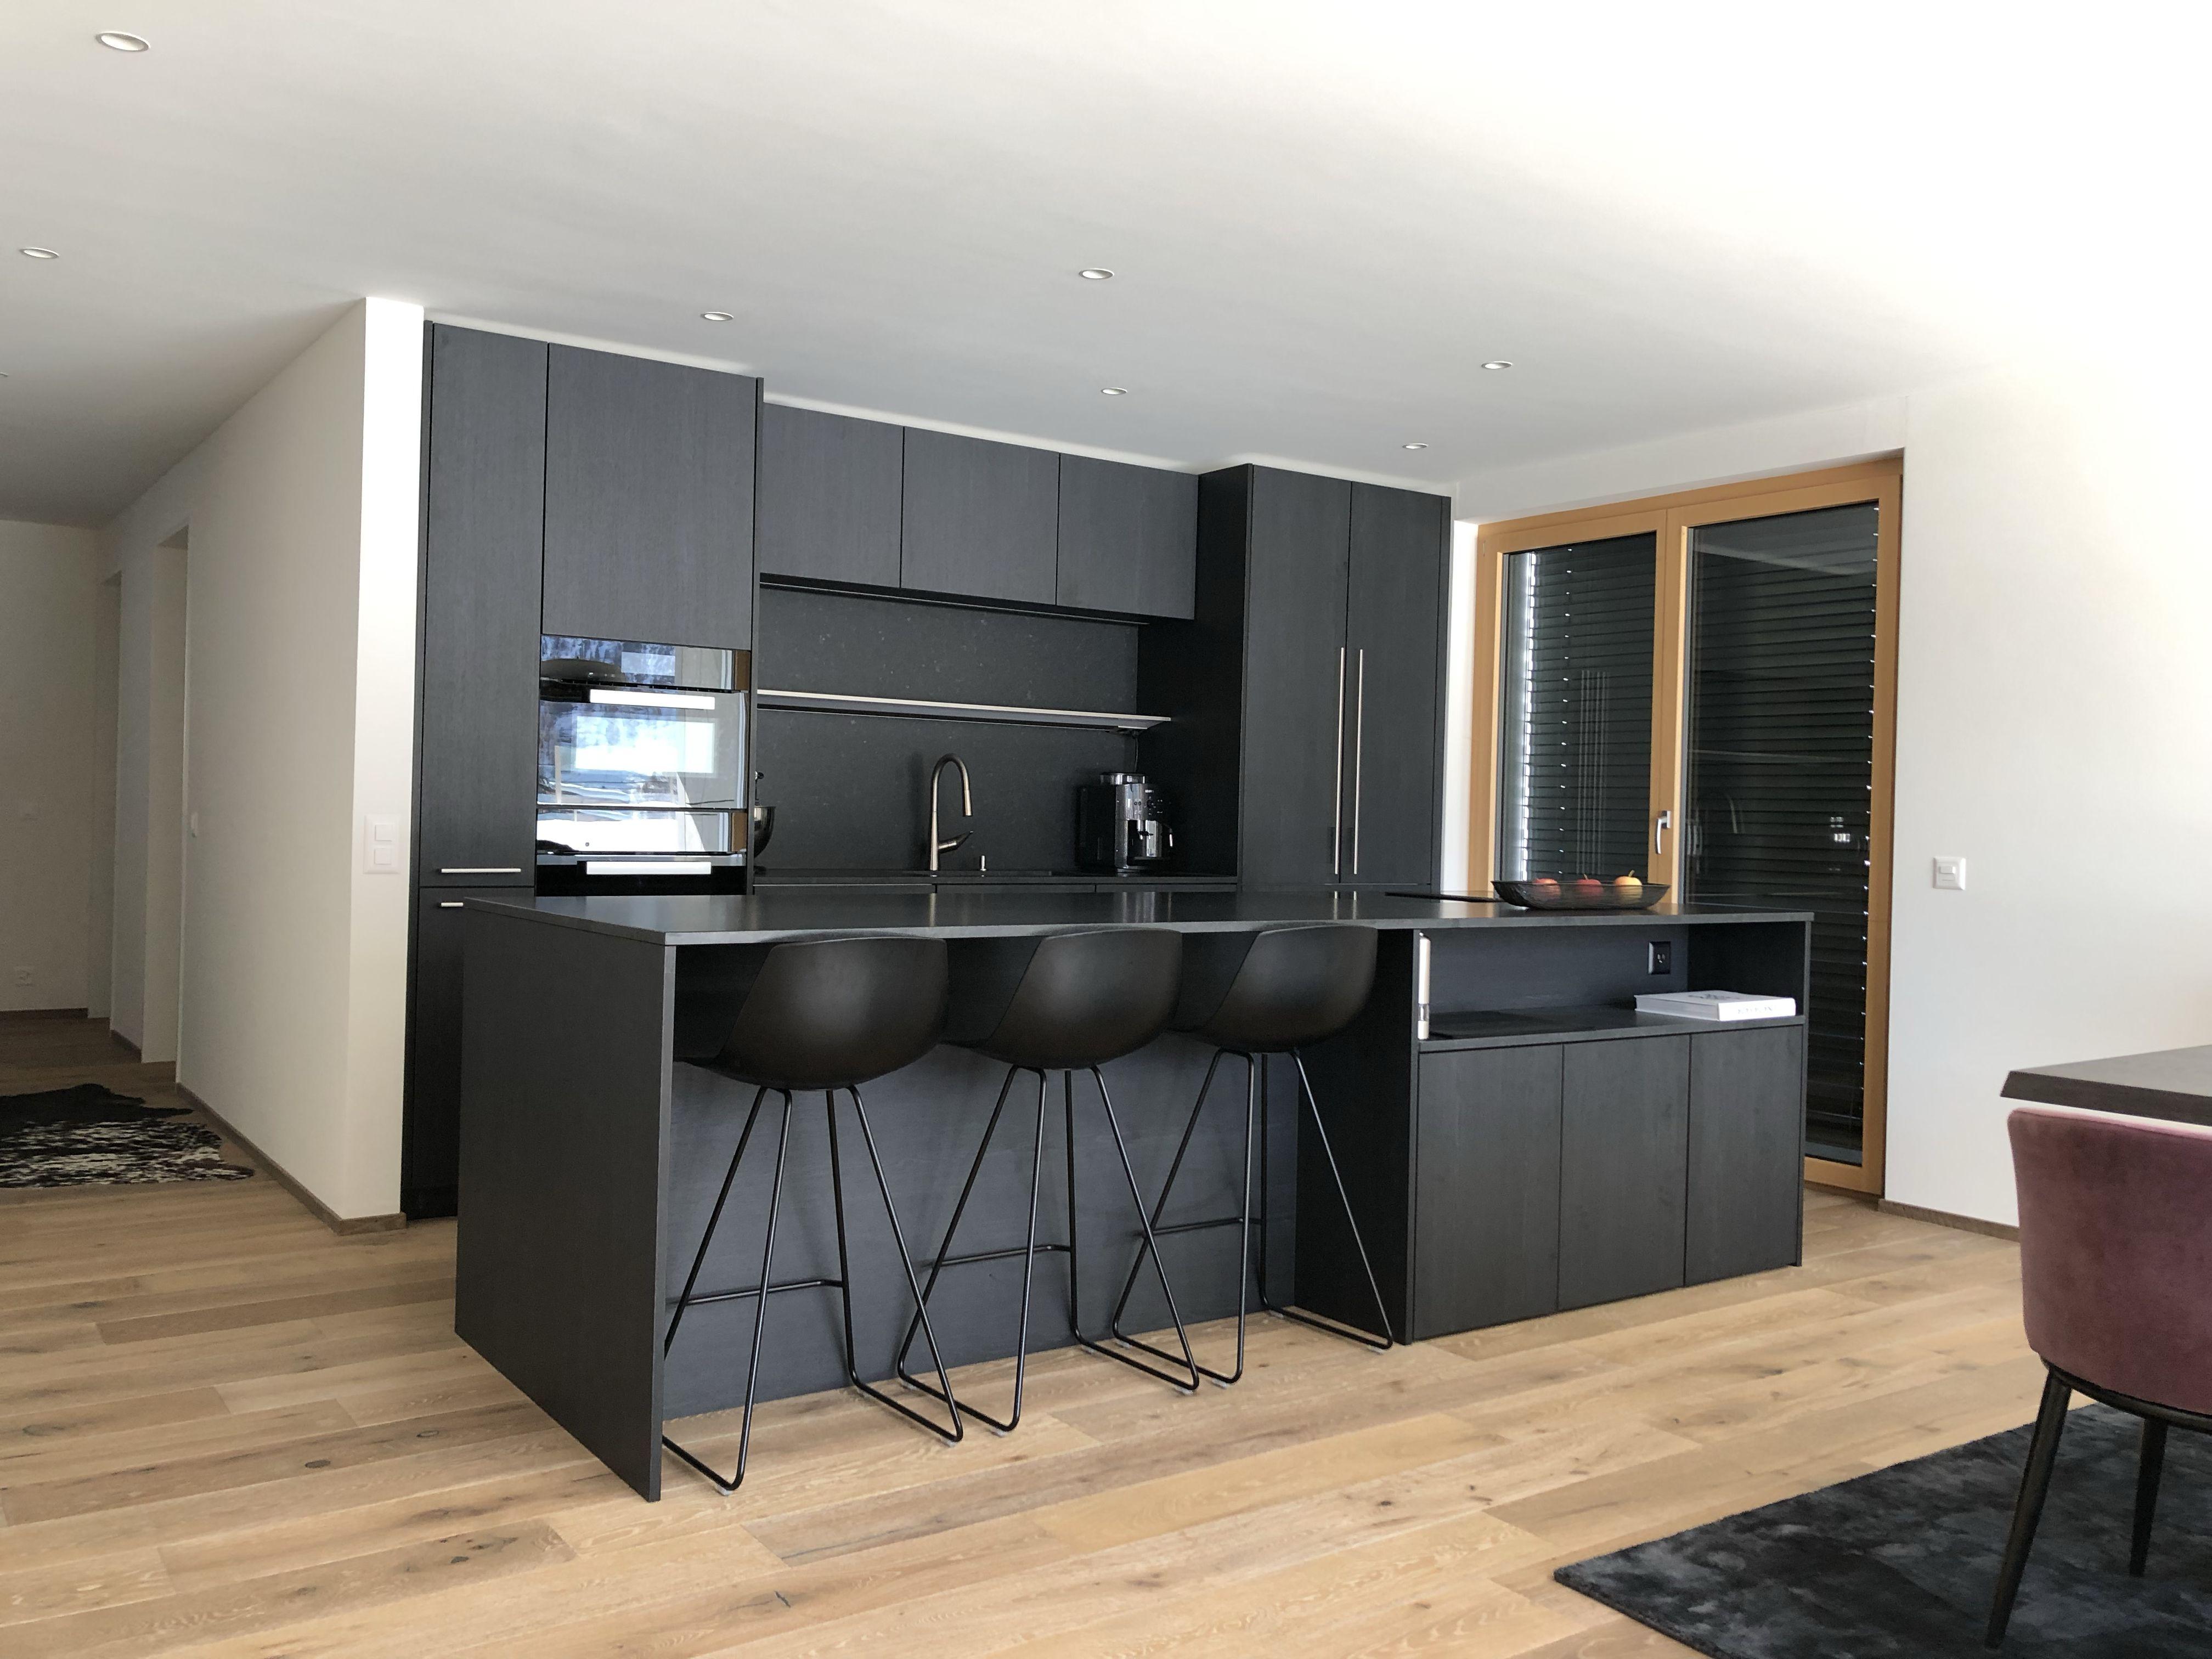 dunkle küchen   dunkle küchen, dunkle küche, küche